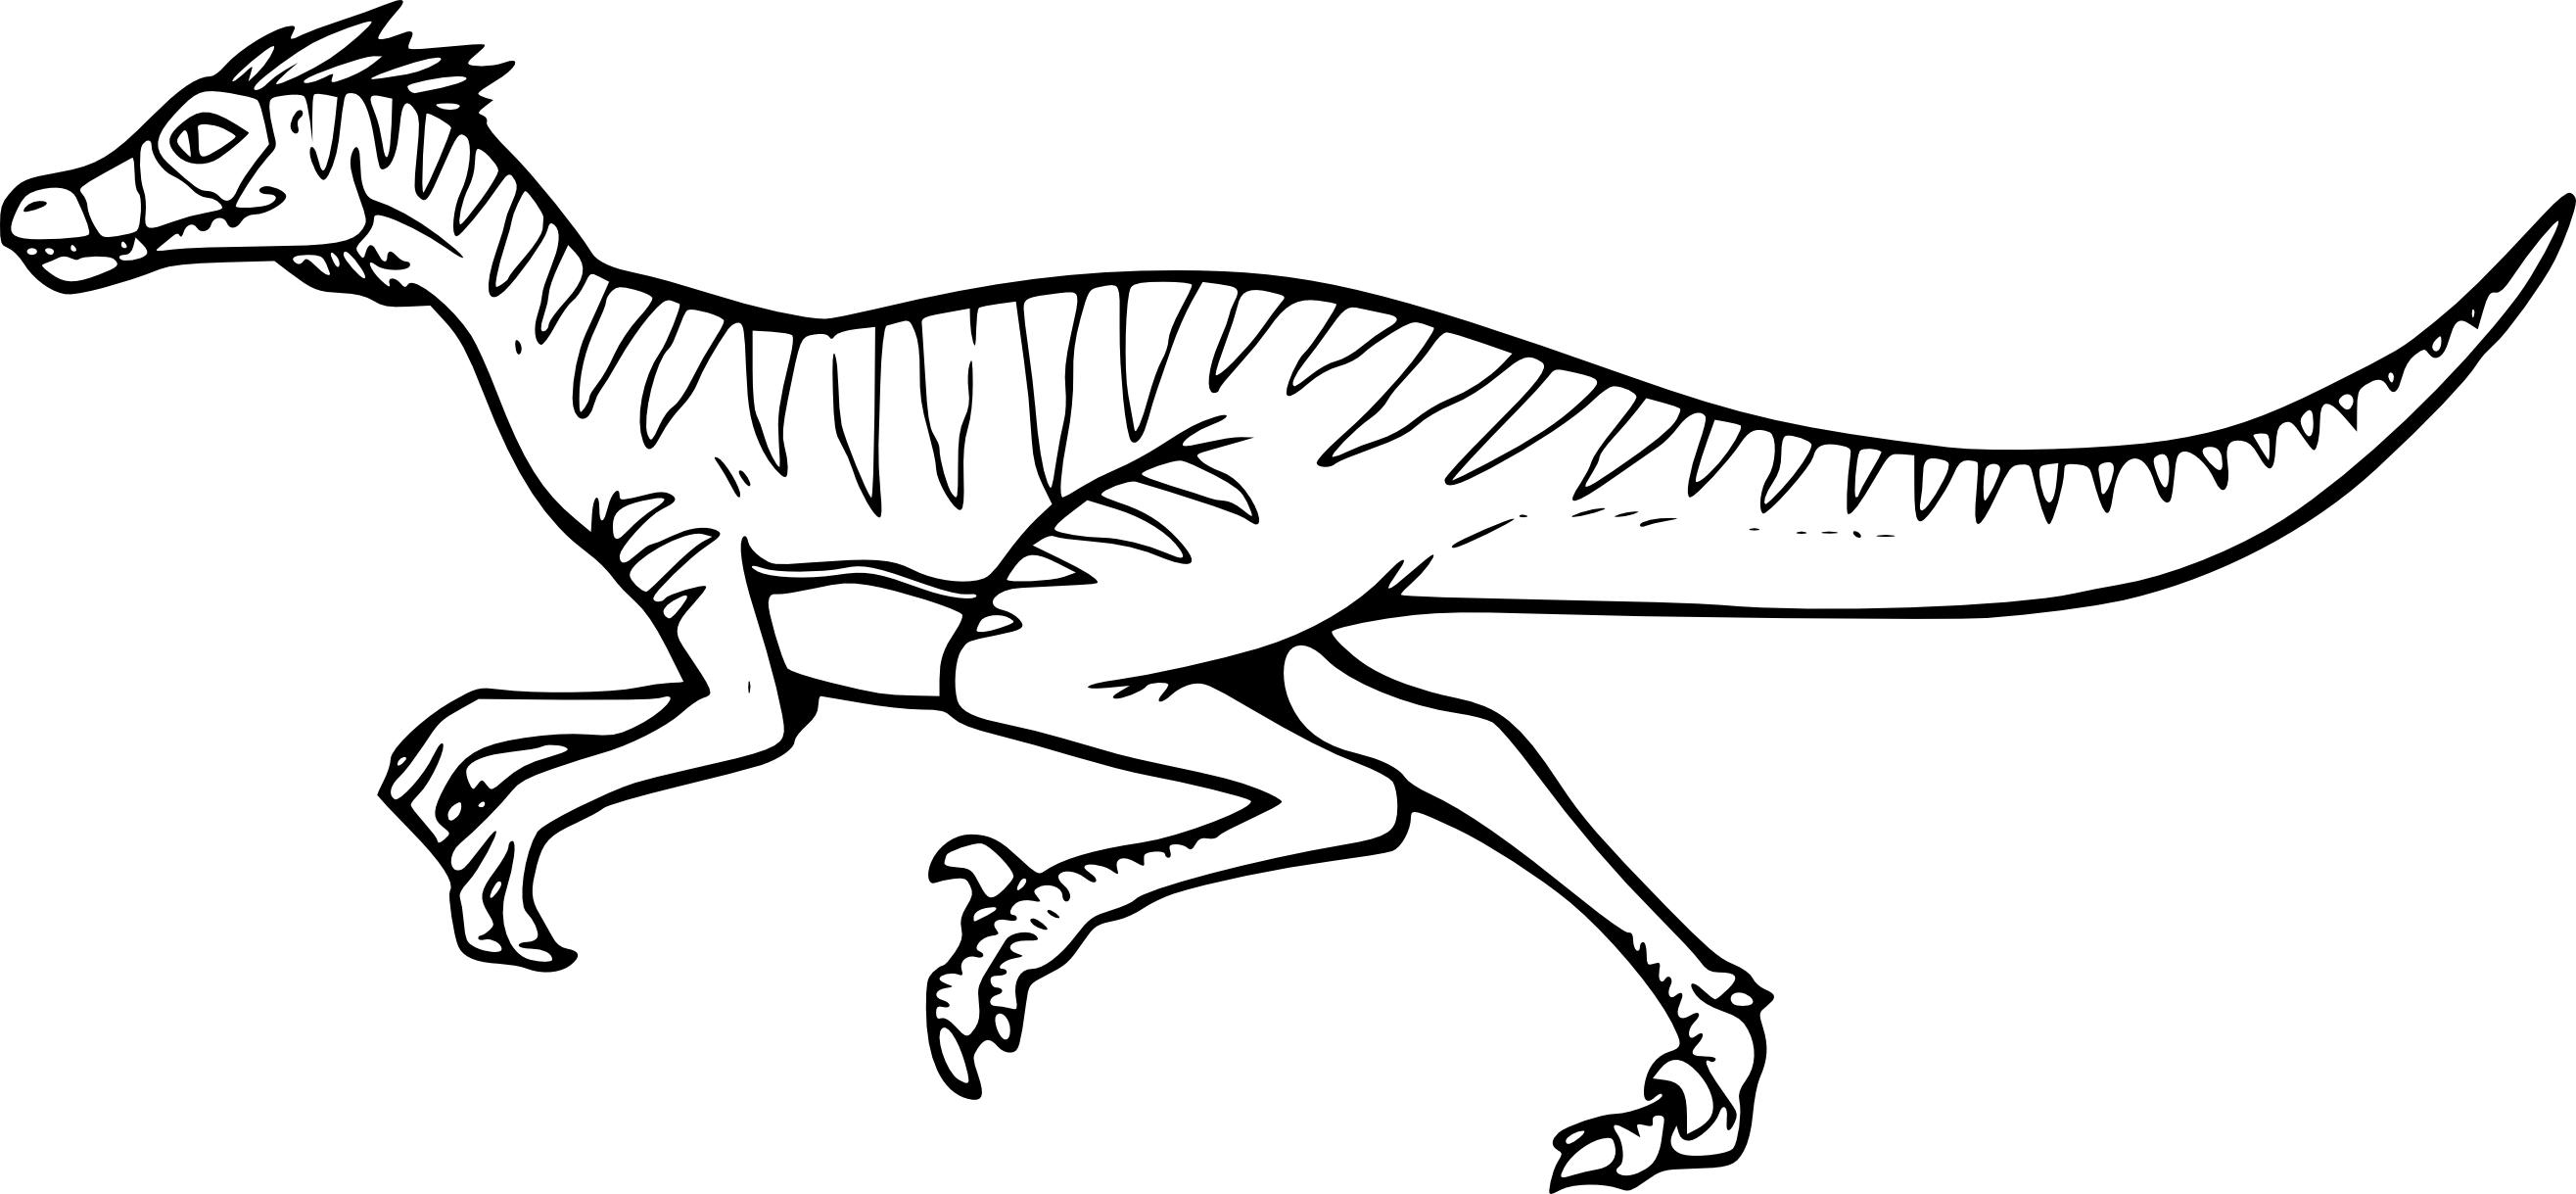 Coloriage Dinosaure Velociraptor A Imprimer